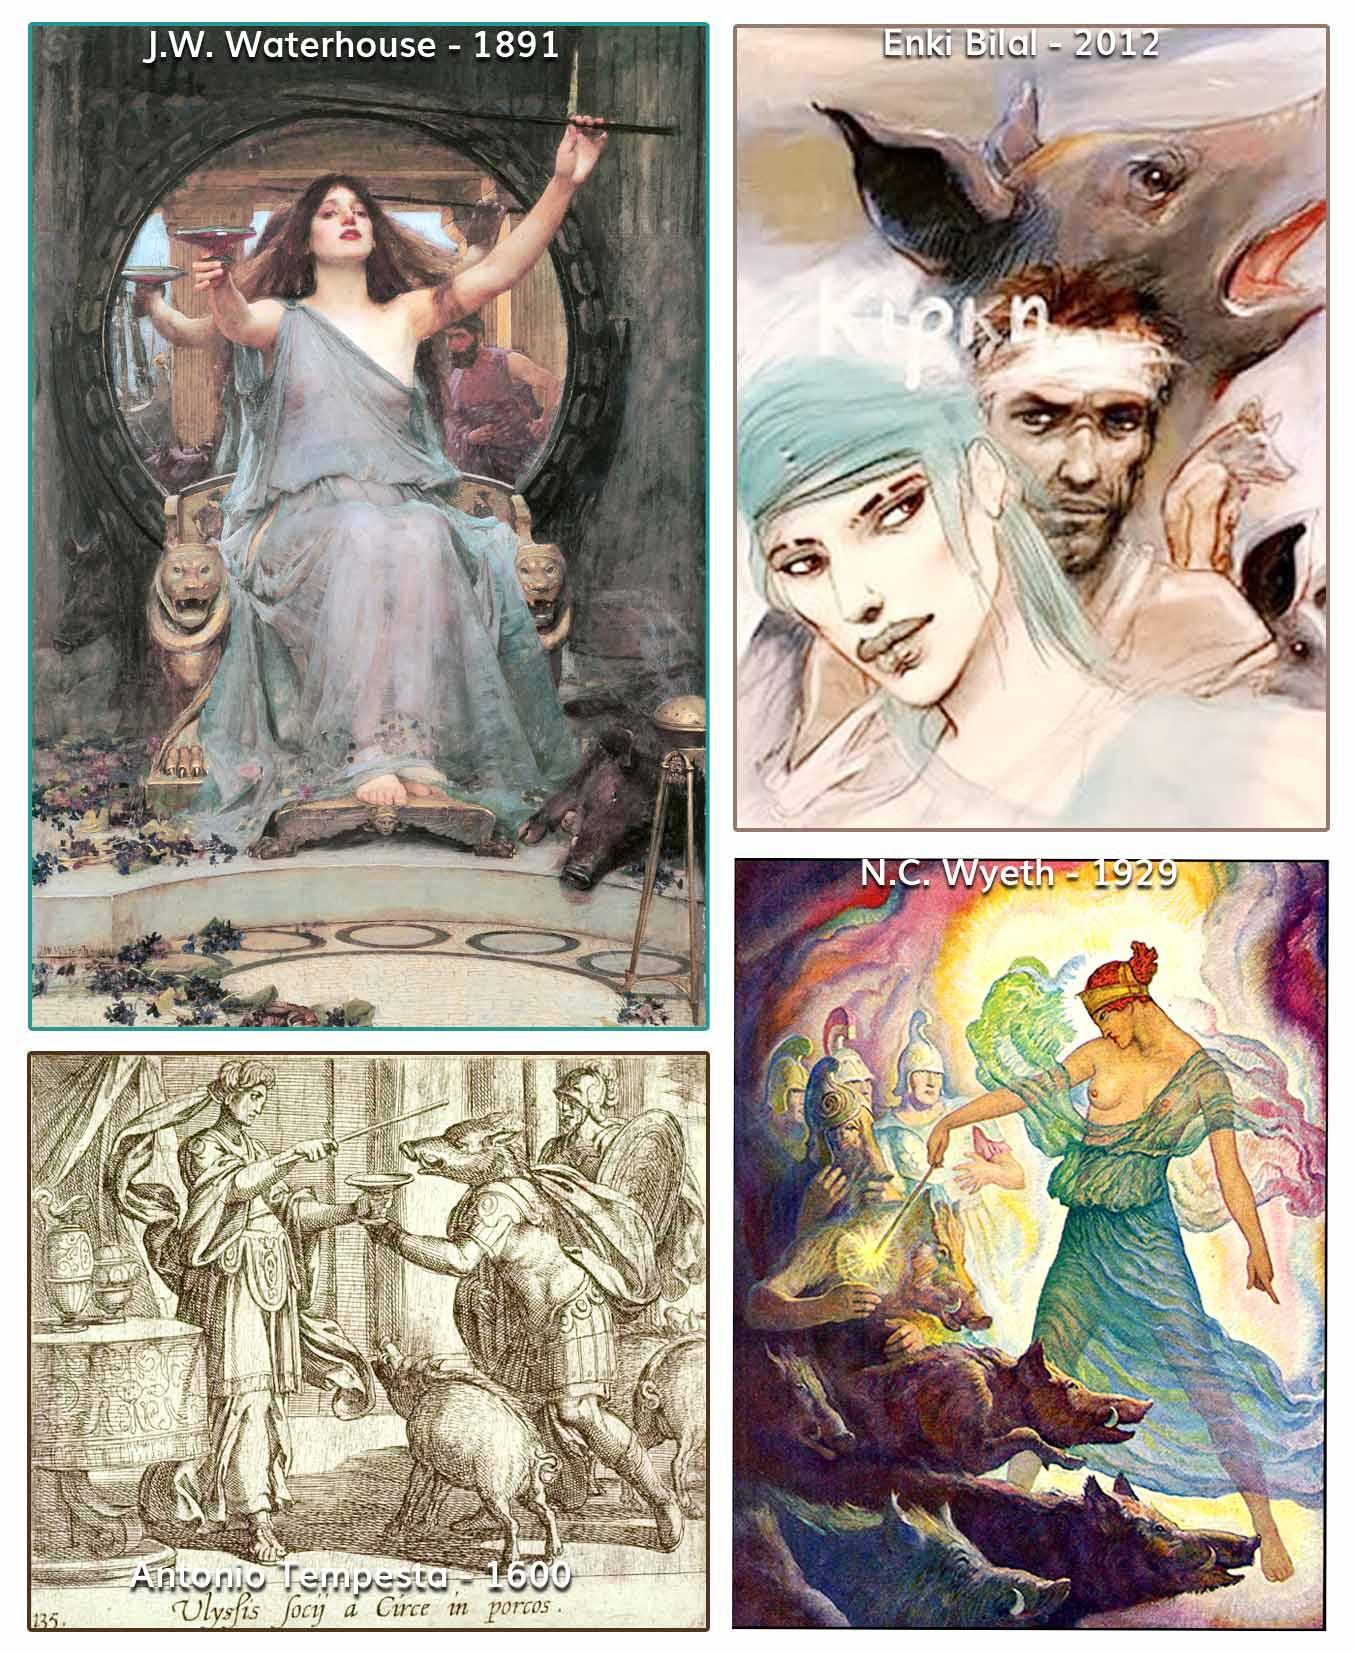 Kirke, Odysseus, Ulysses, Homerus, Enki Bilal, J.W. Waterhouse, N.C.Wyeth, Antonio Tempesta